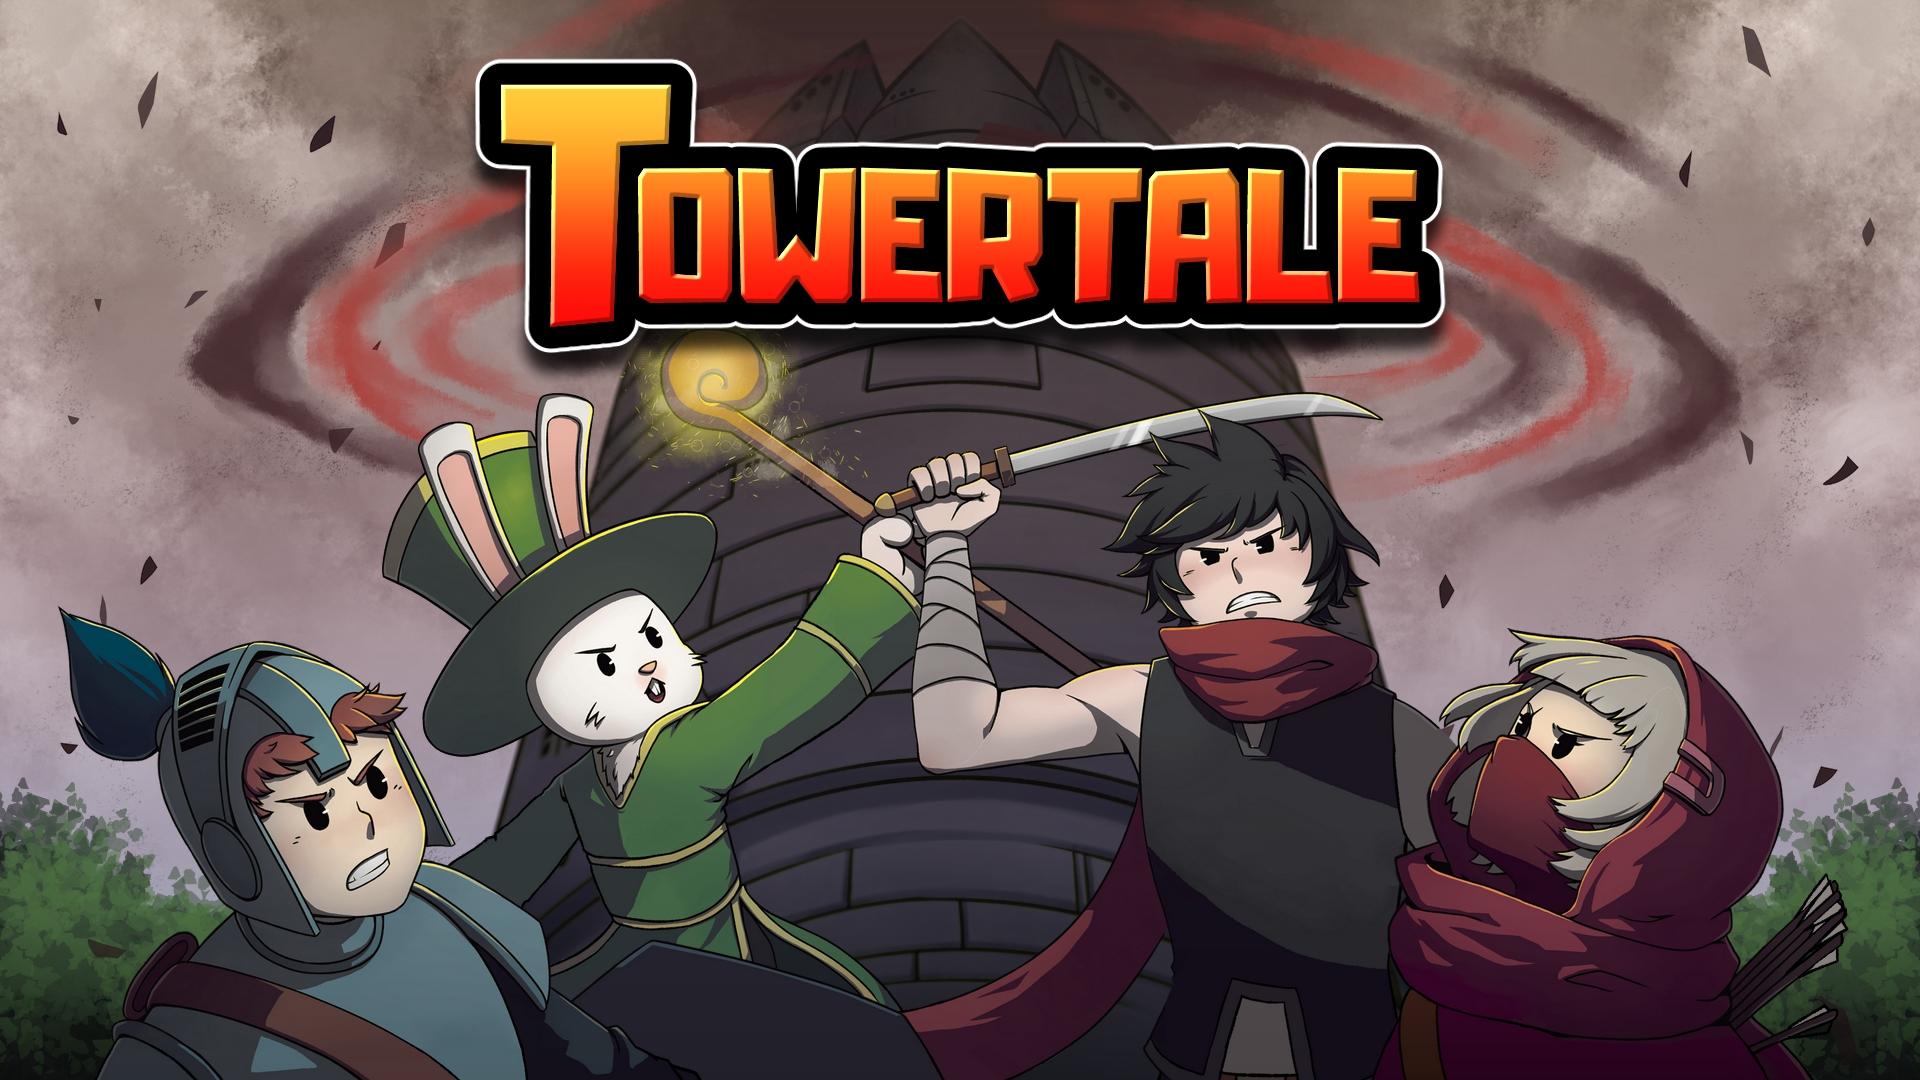 Towertale